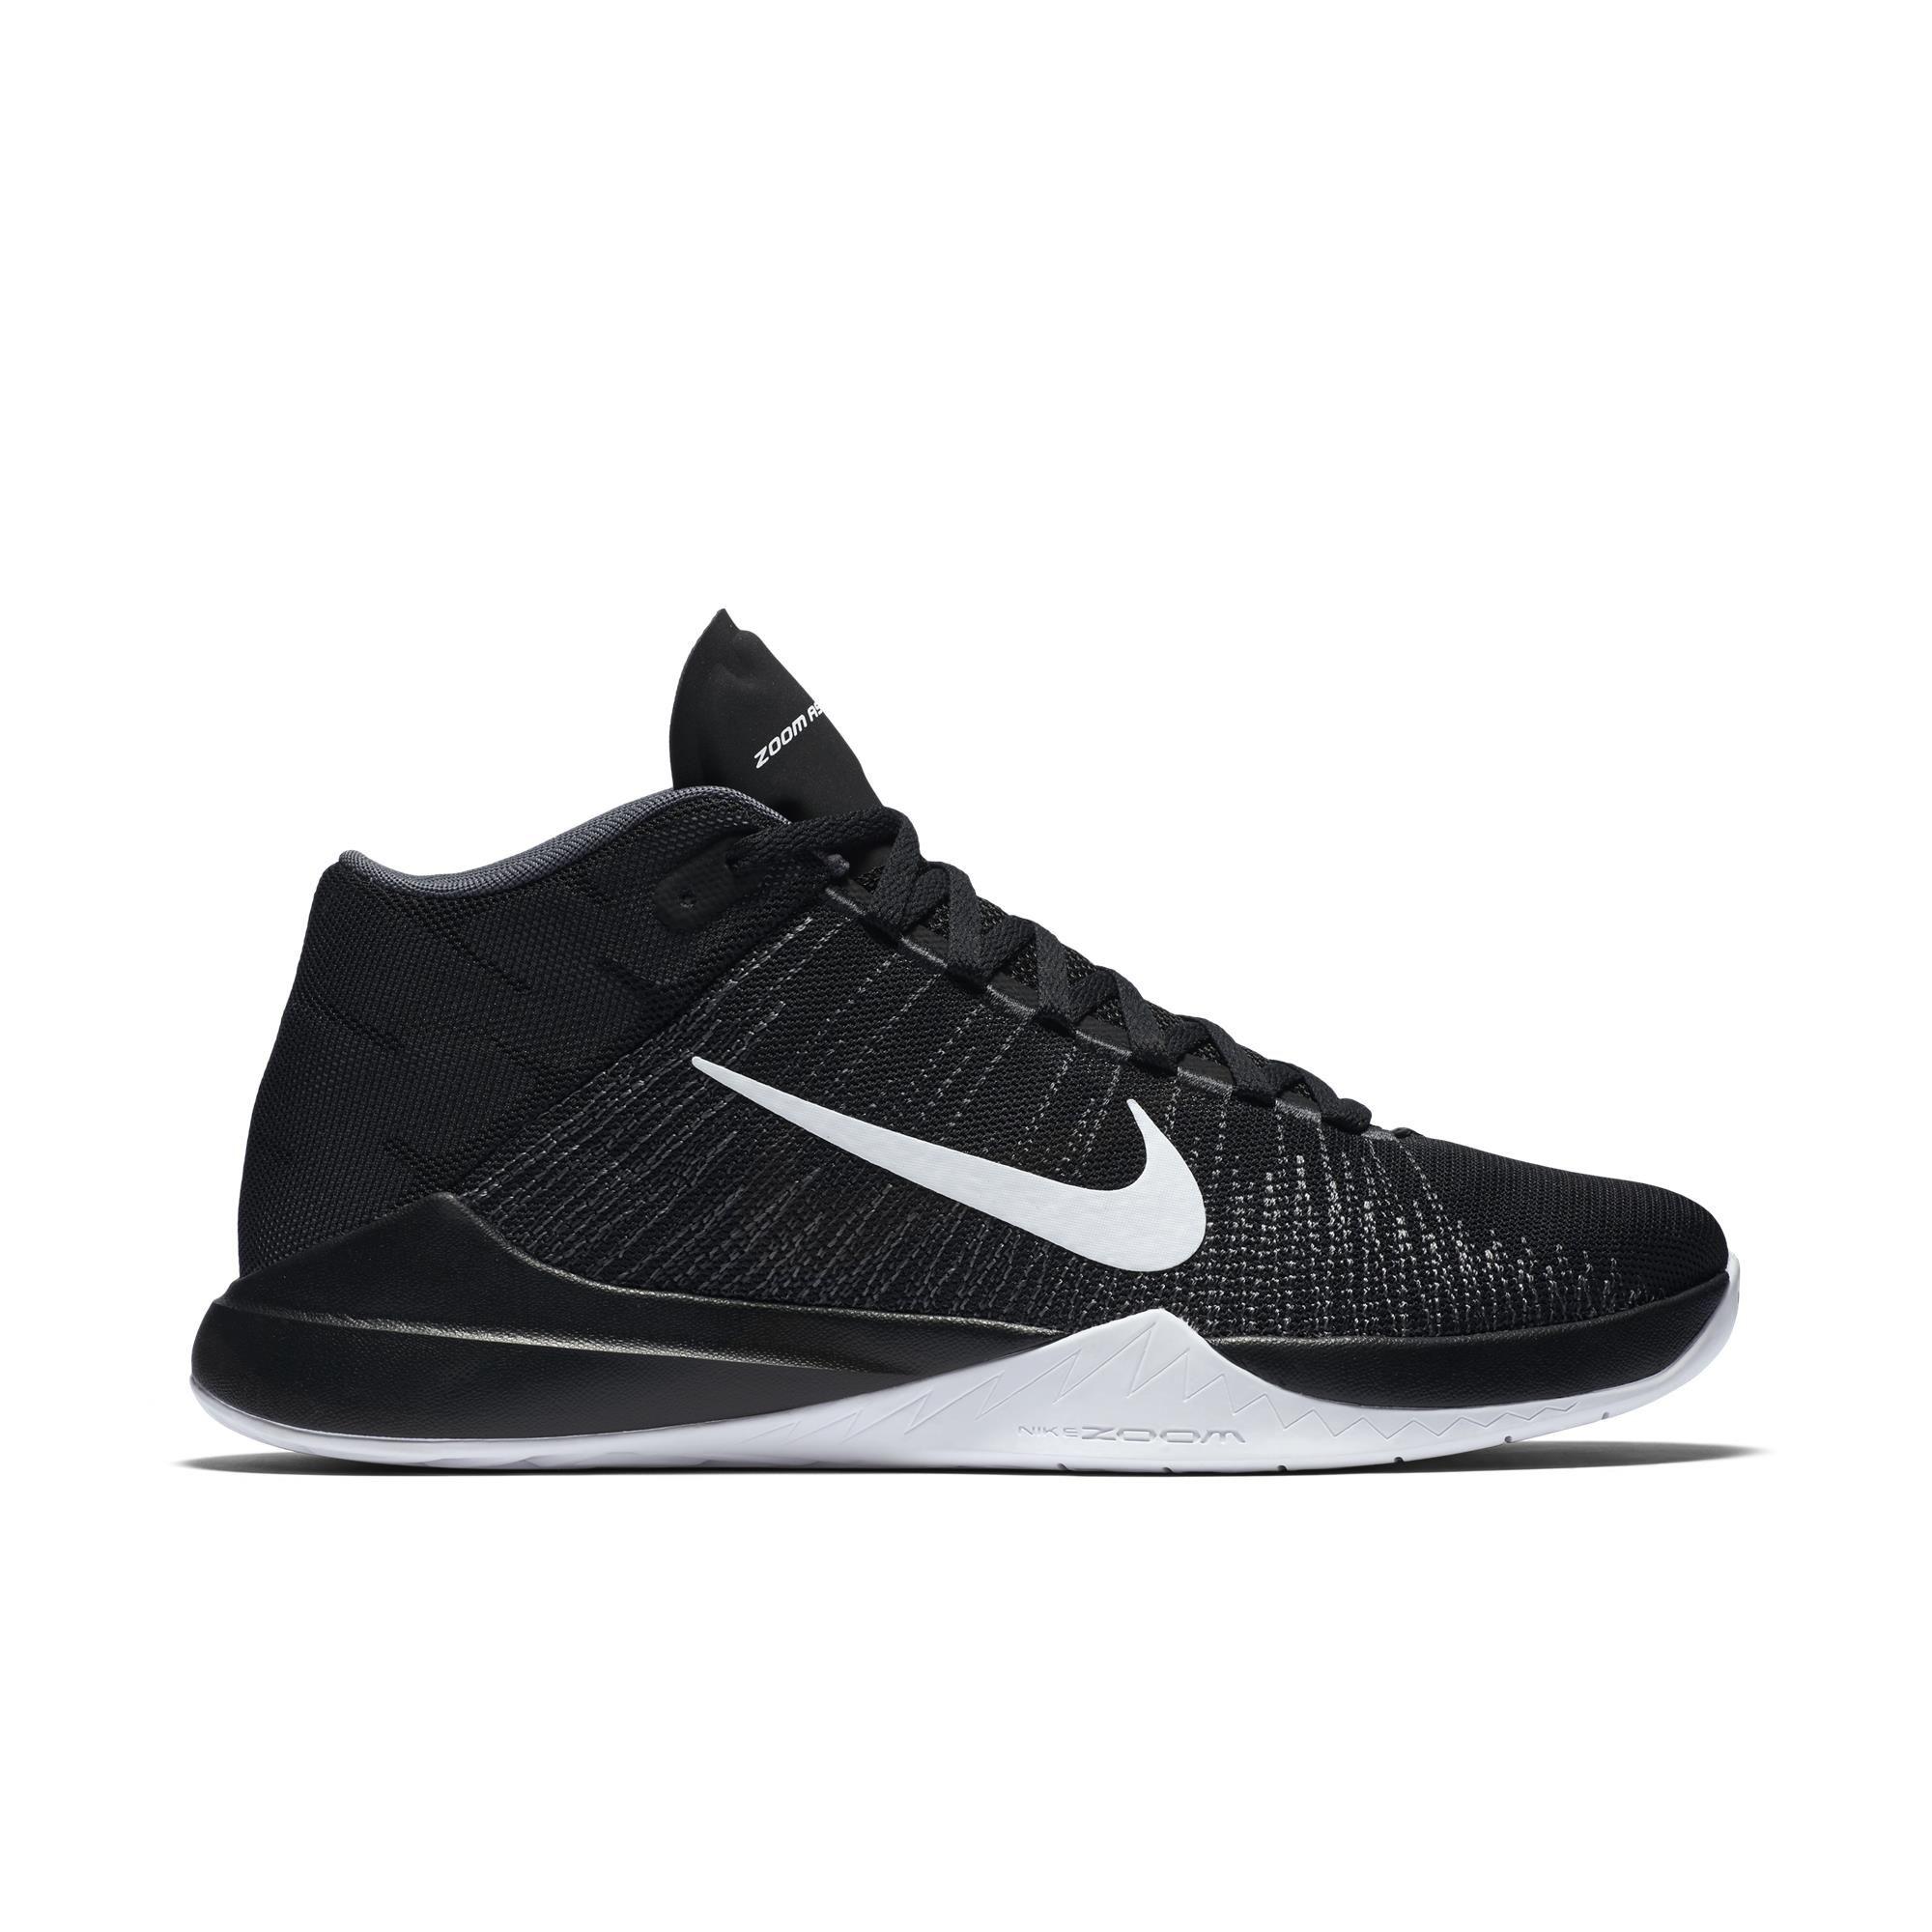 3d01fa6f880 Tênis Nike Zoom Ascention Masculino